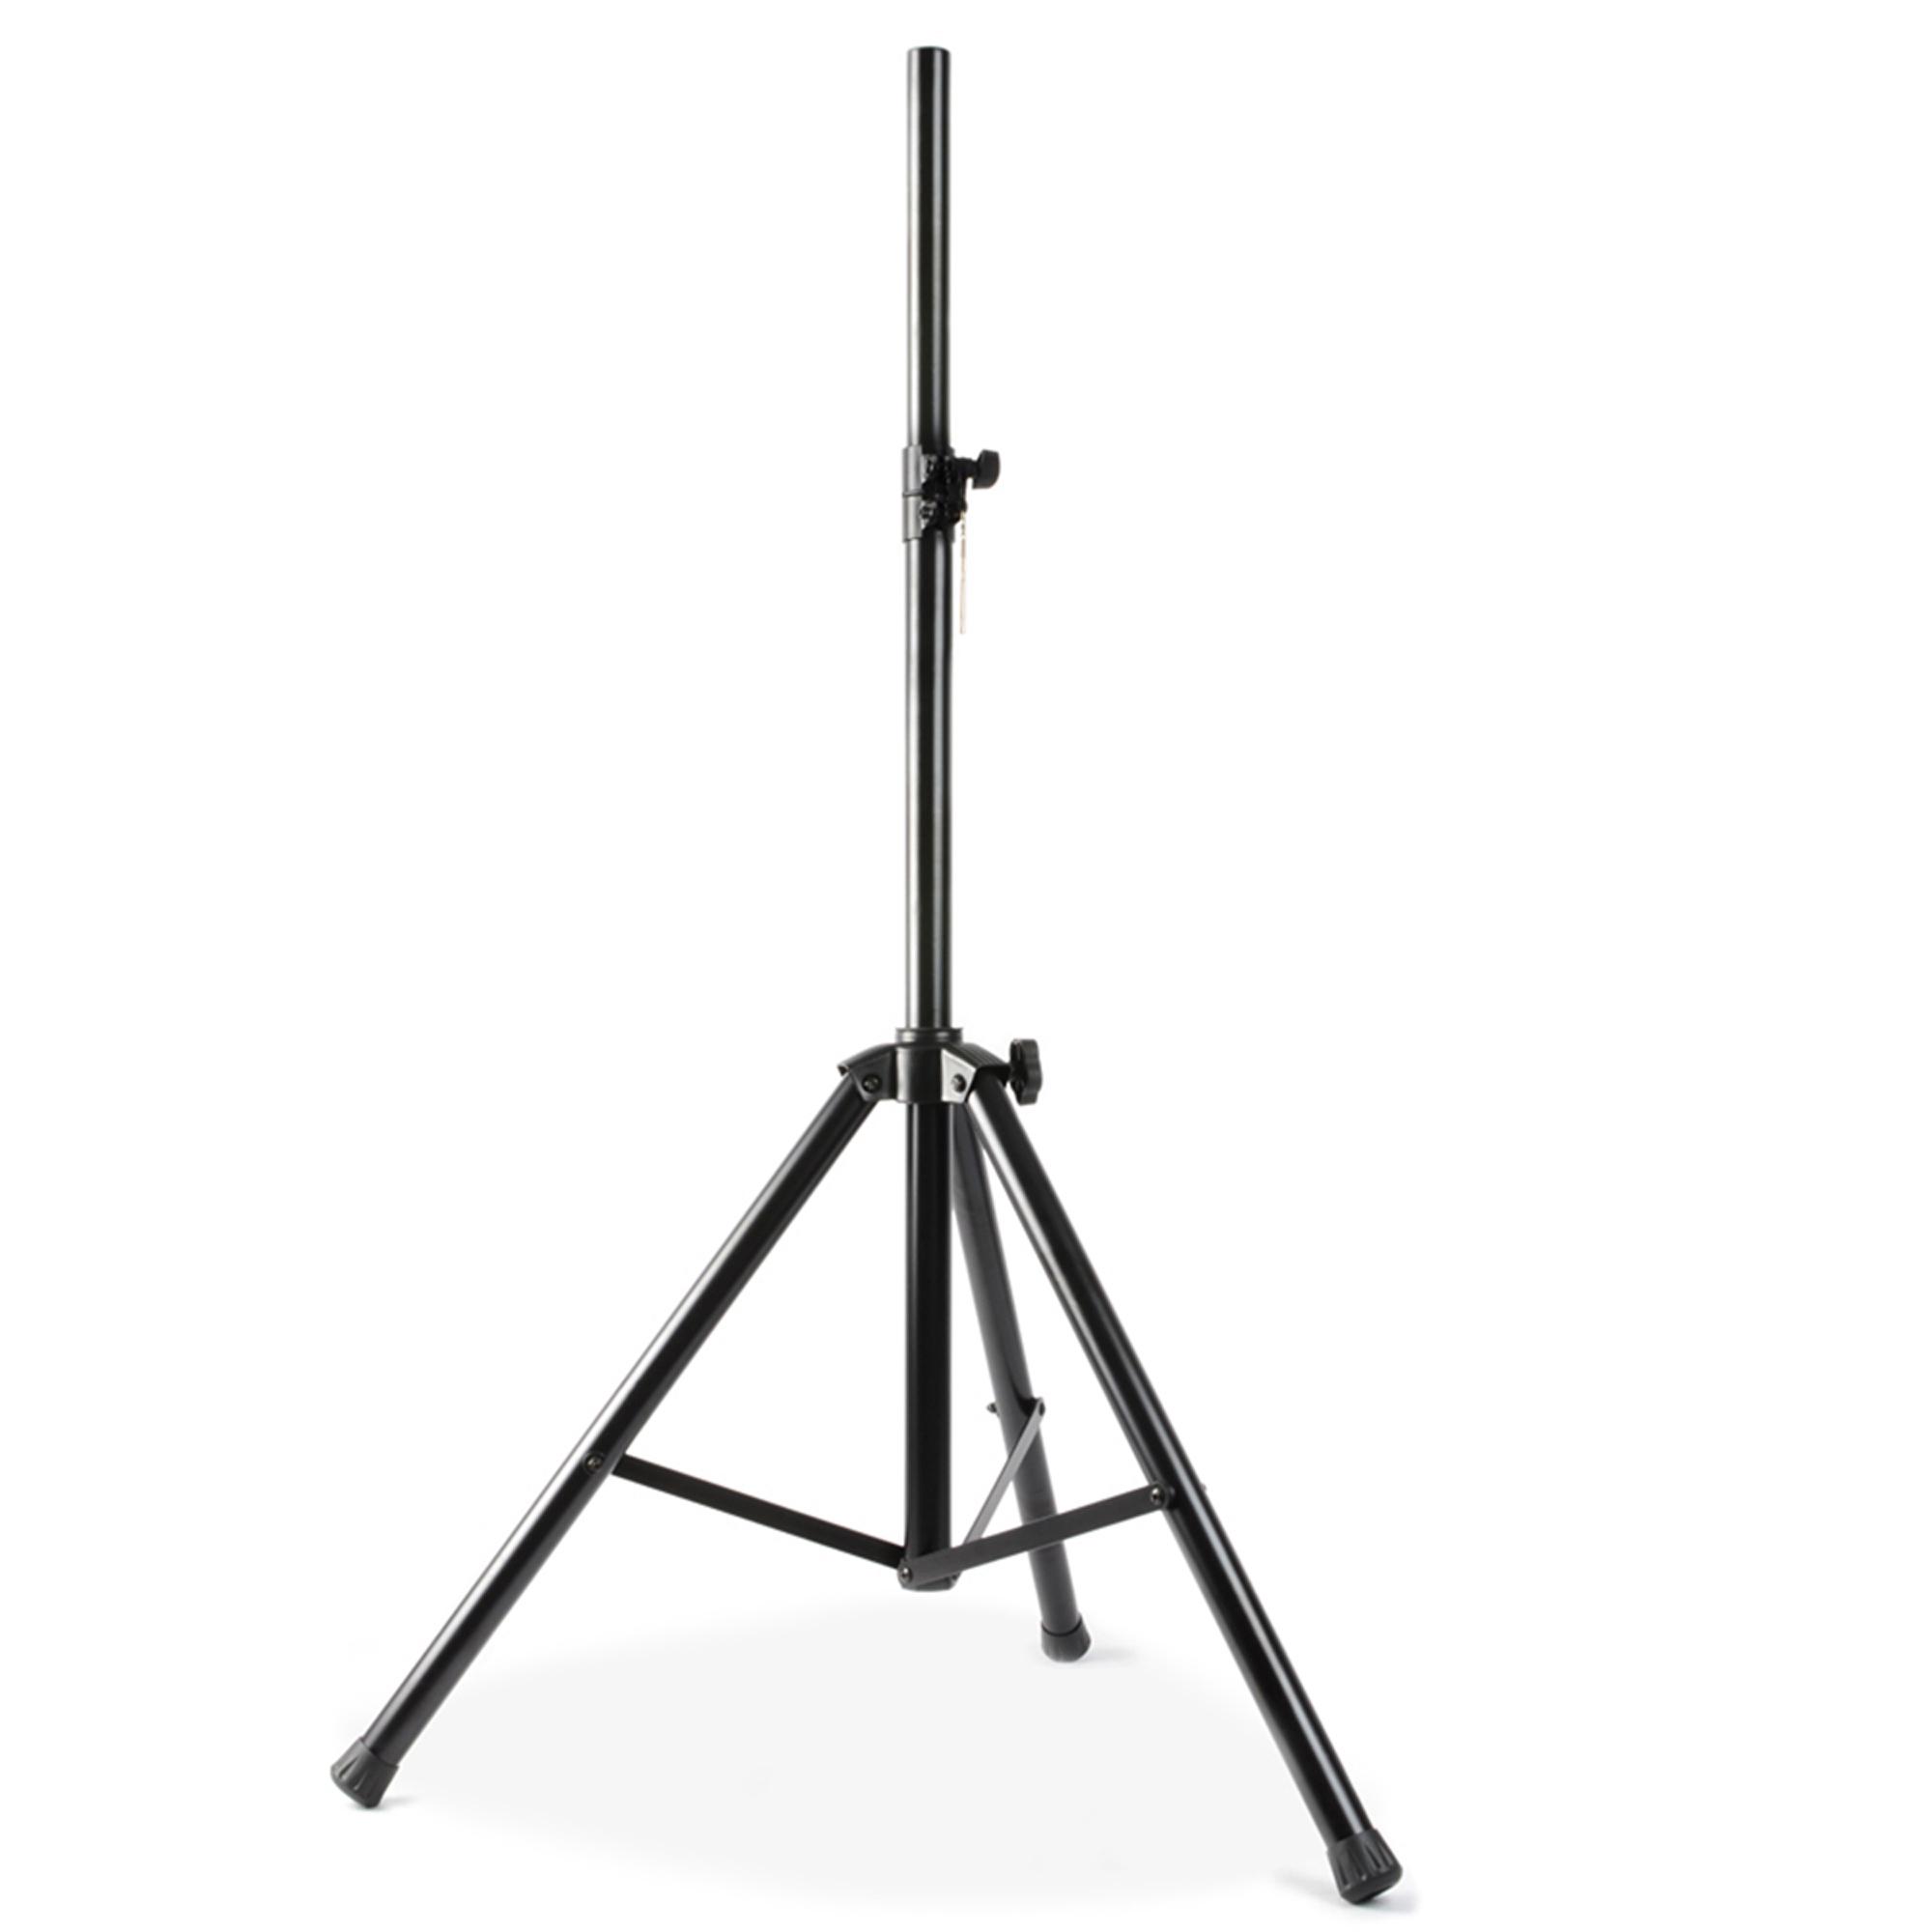 Speaker Stand Professional Pa 80kg Foldable Tripod Legs